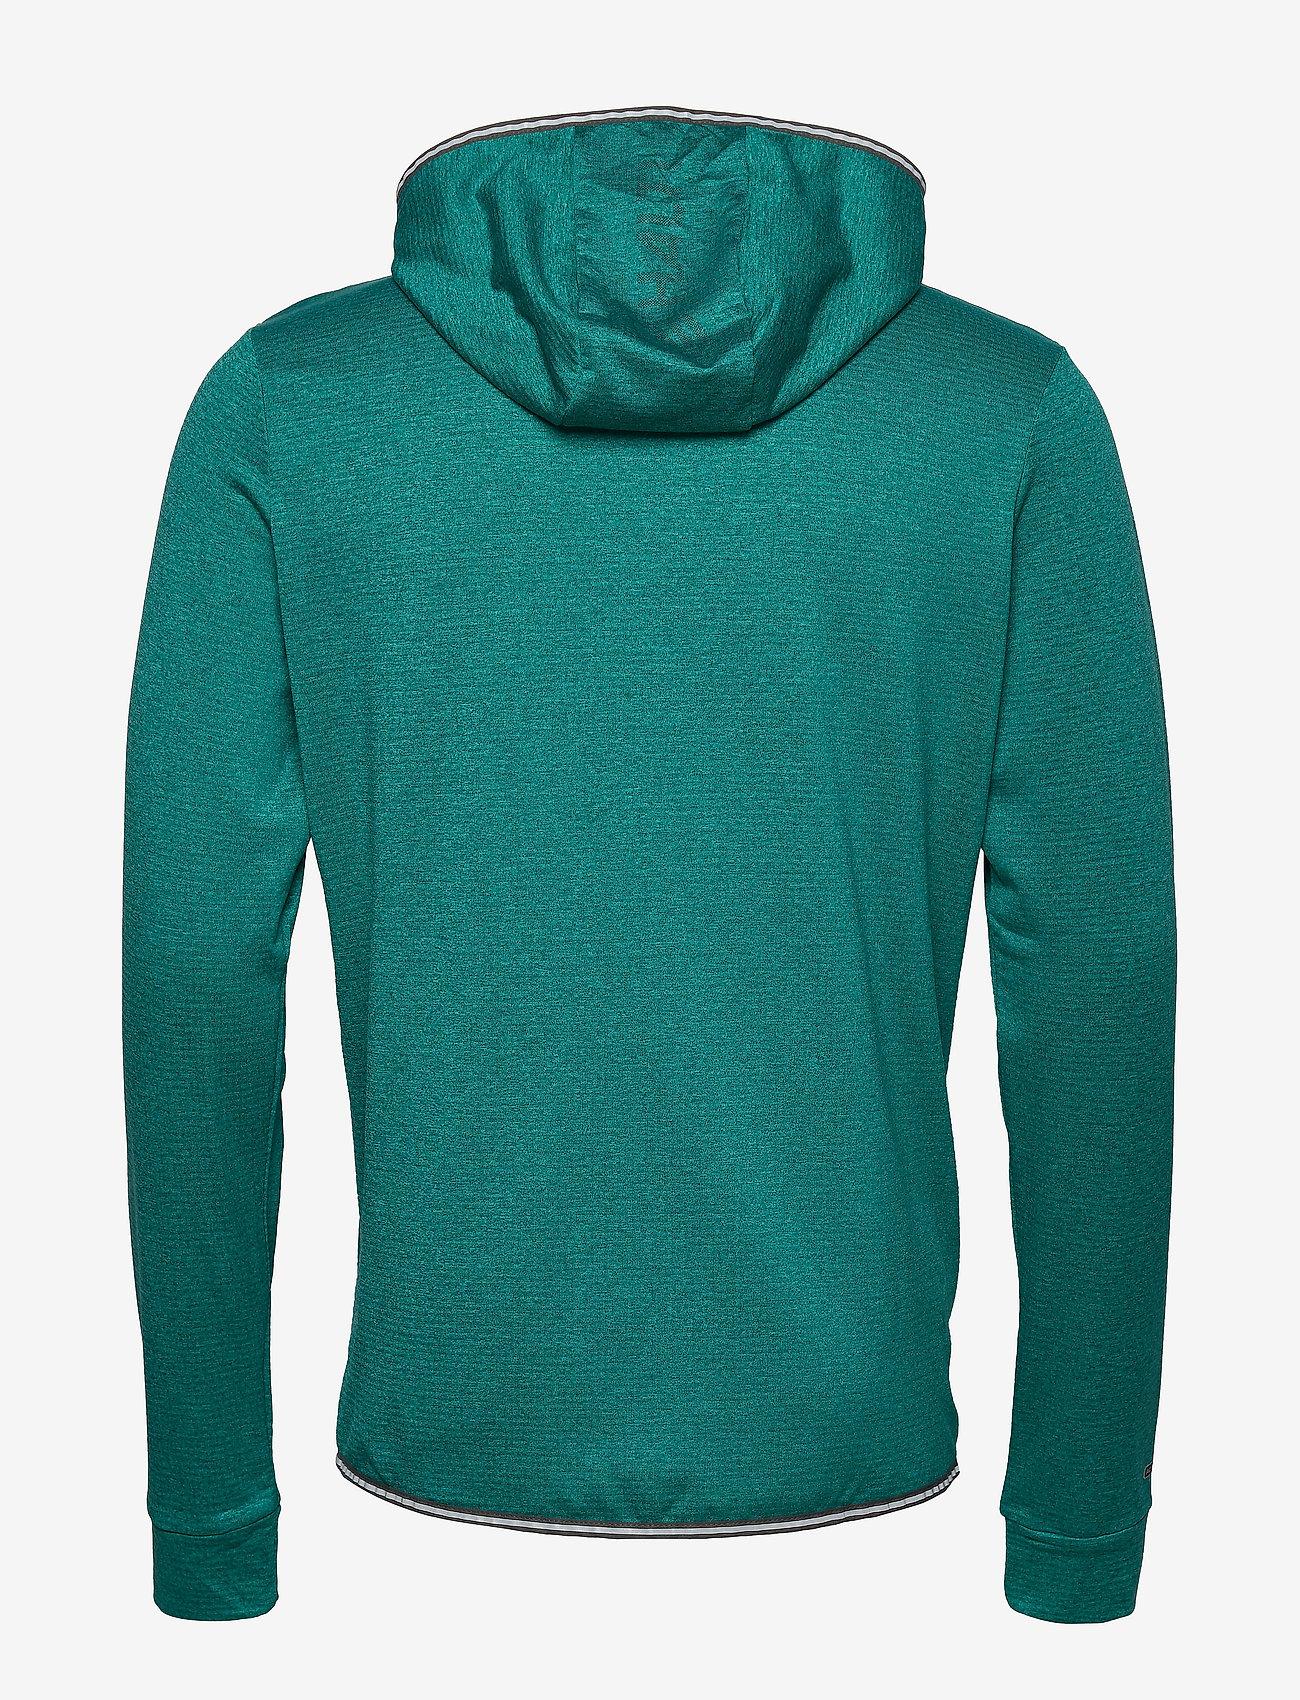 Halti - Puijo M Hoodie jacket - fleece midlayer - fanfare green melange - 1